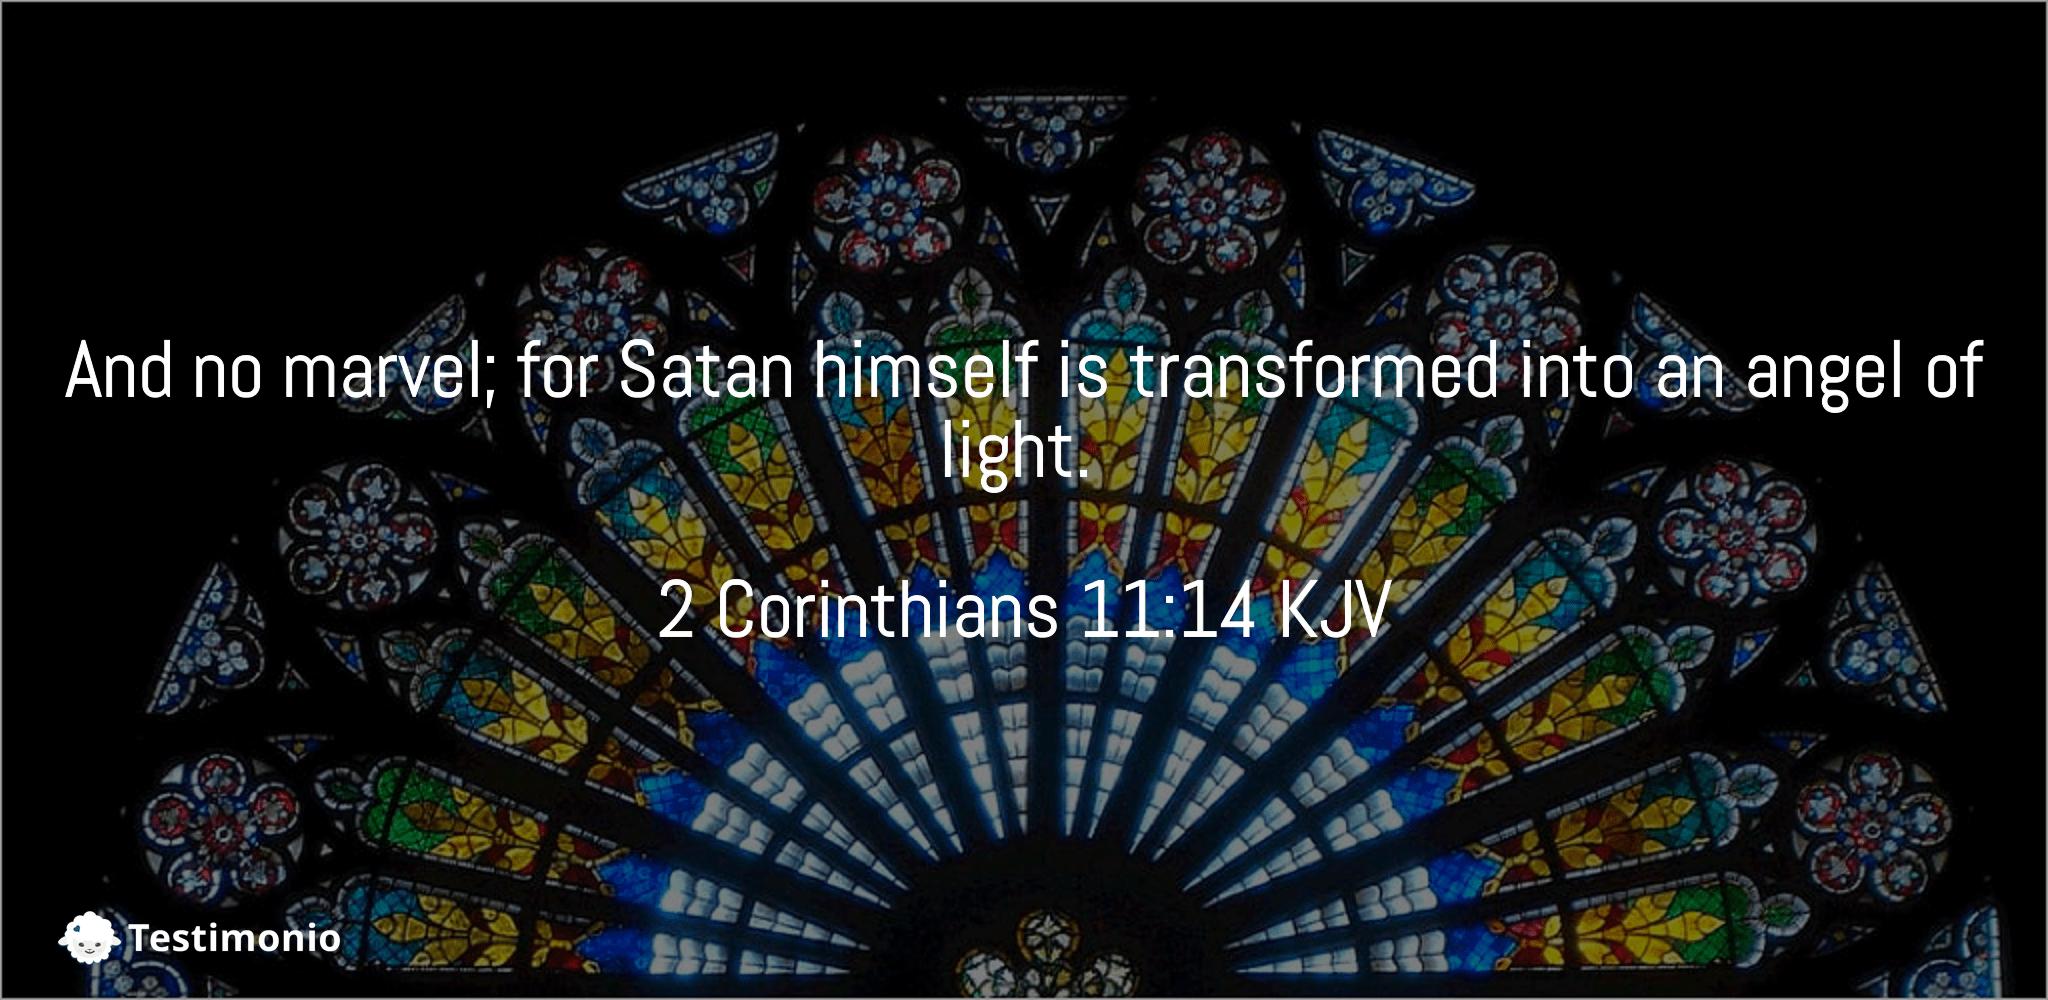 2 Corinthians 11:14